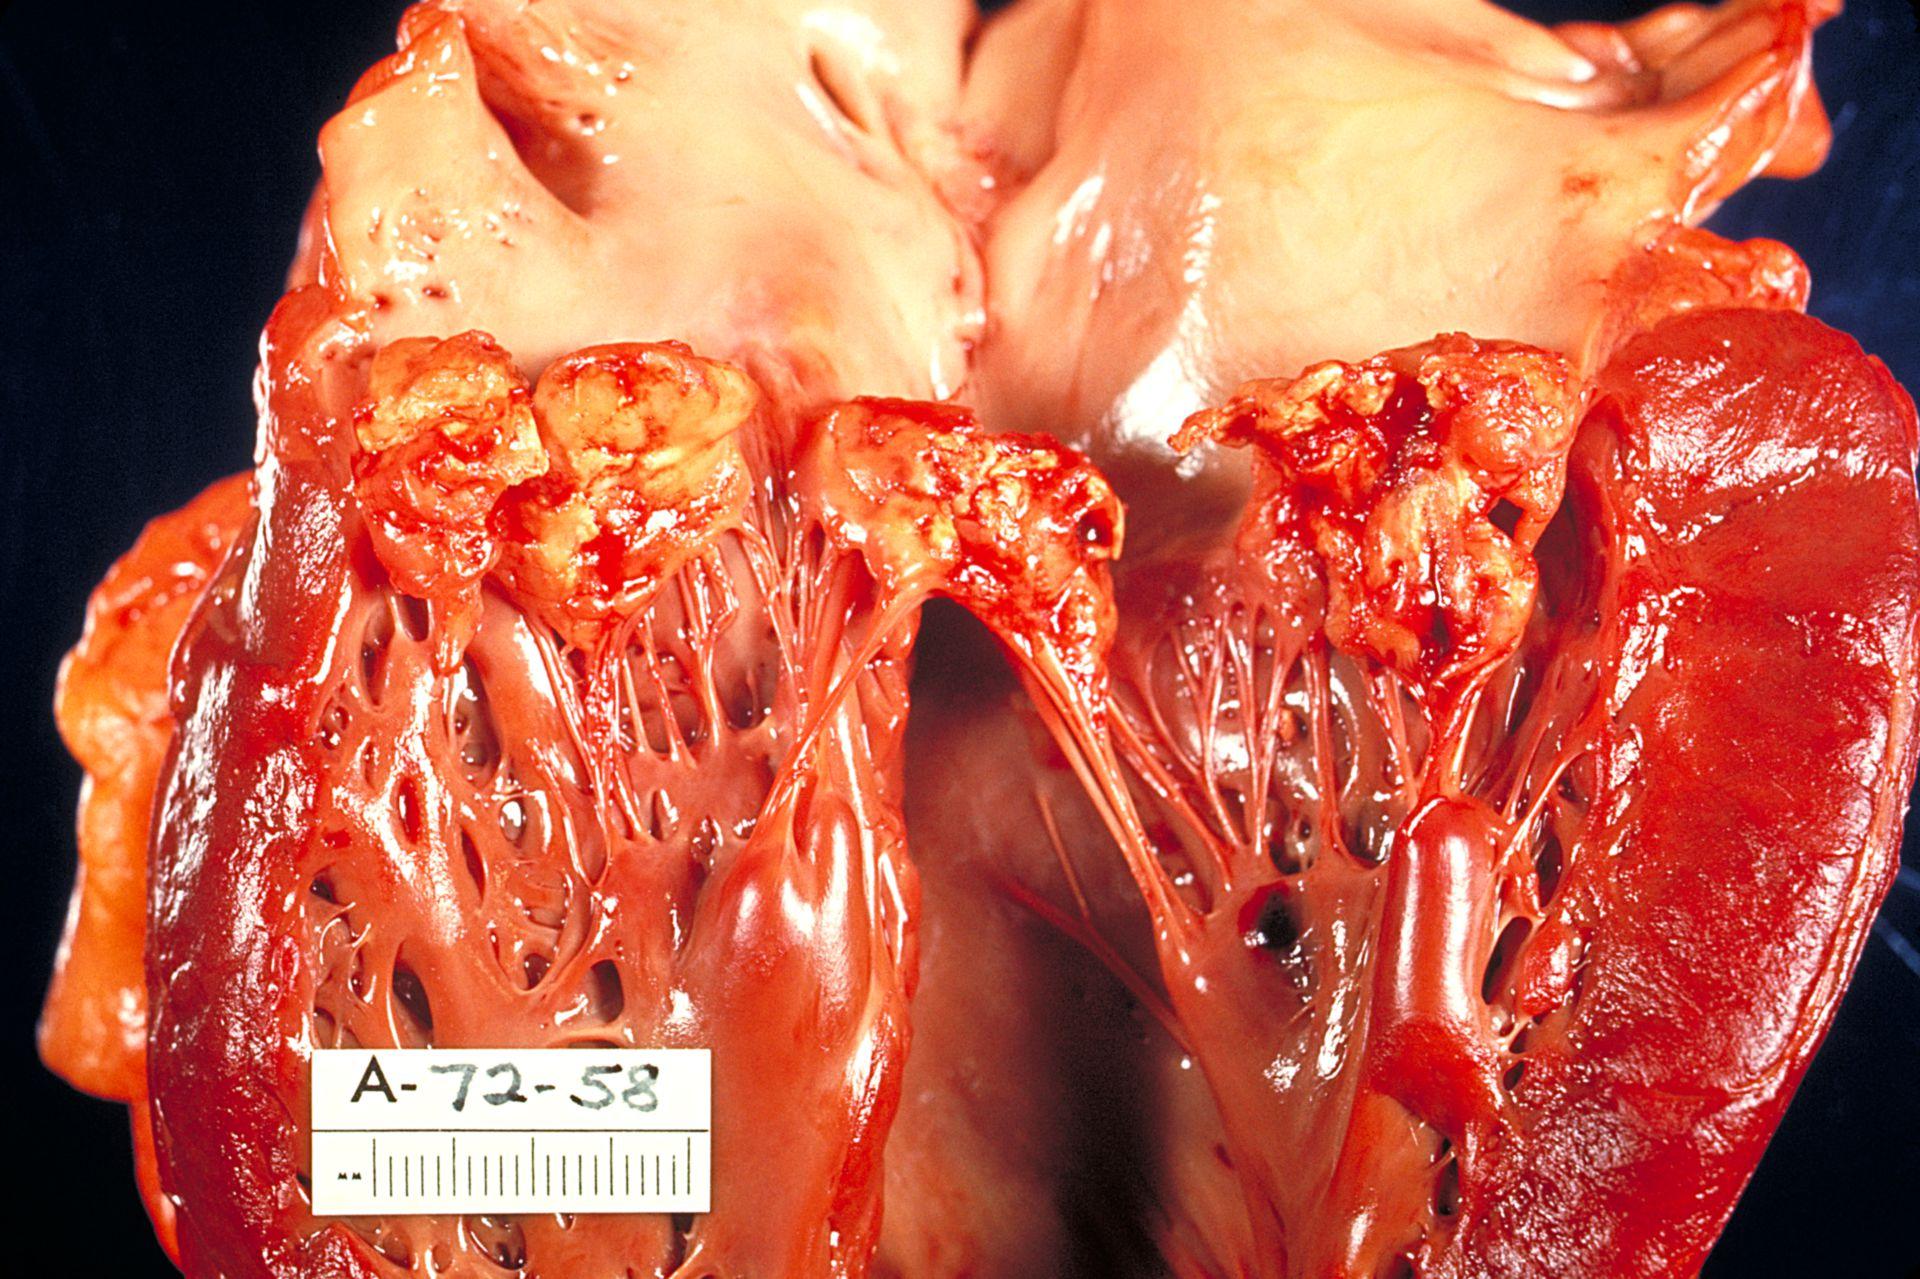 Subacute bacterial endocarditis involving mitral valve